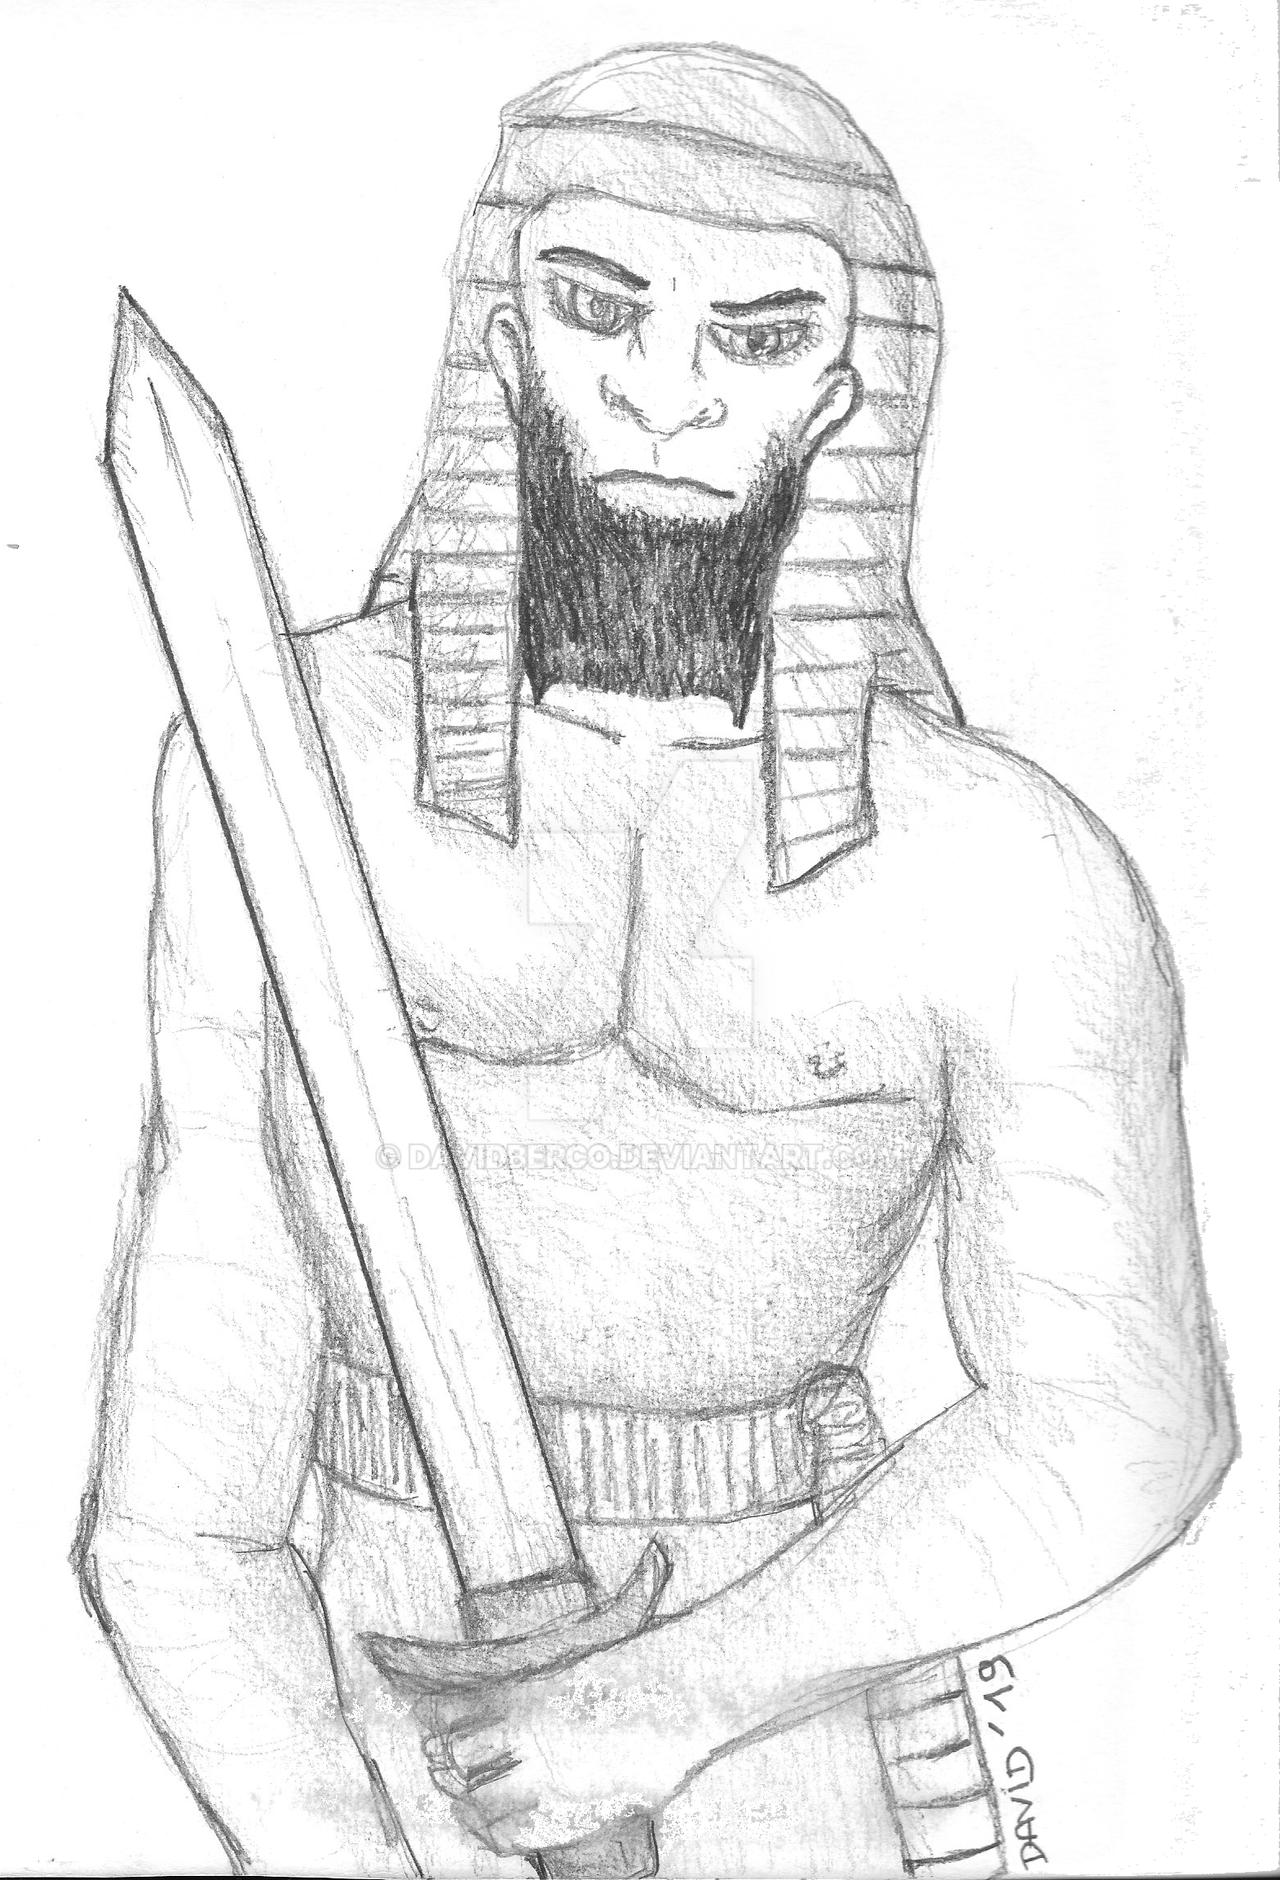 savage arabian sword by DavidBerco